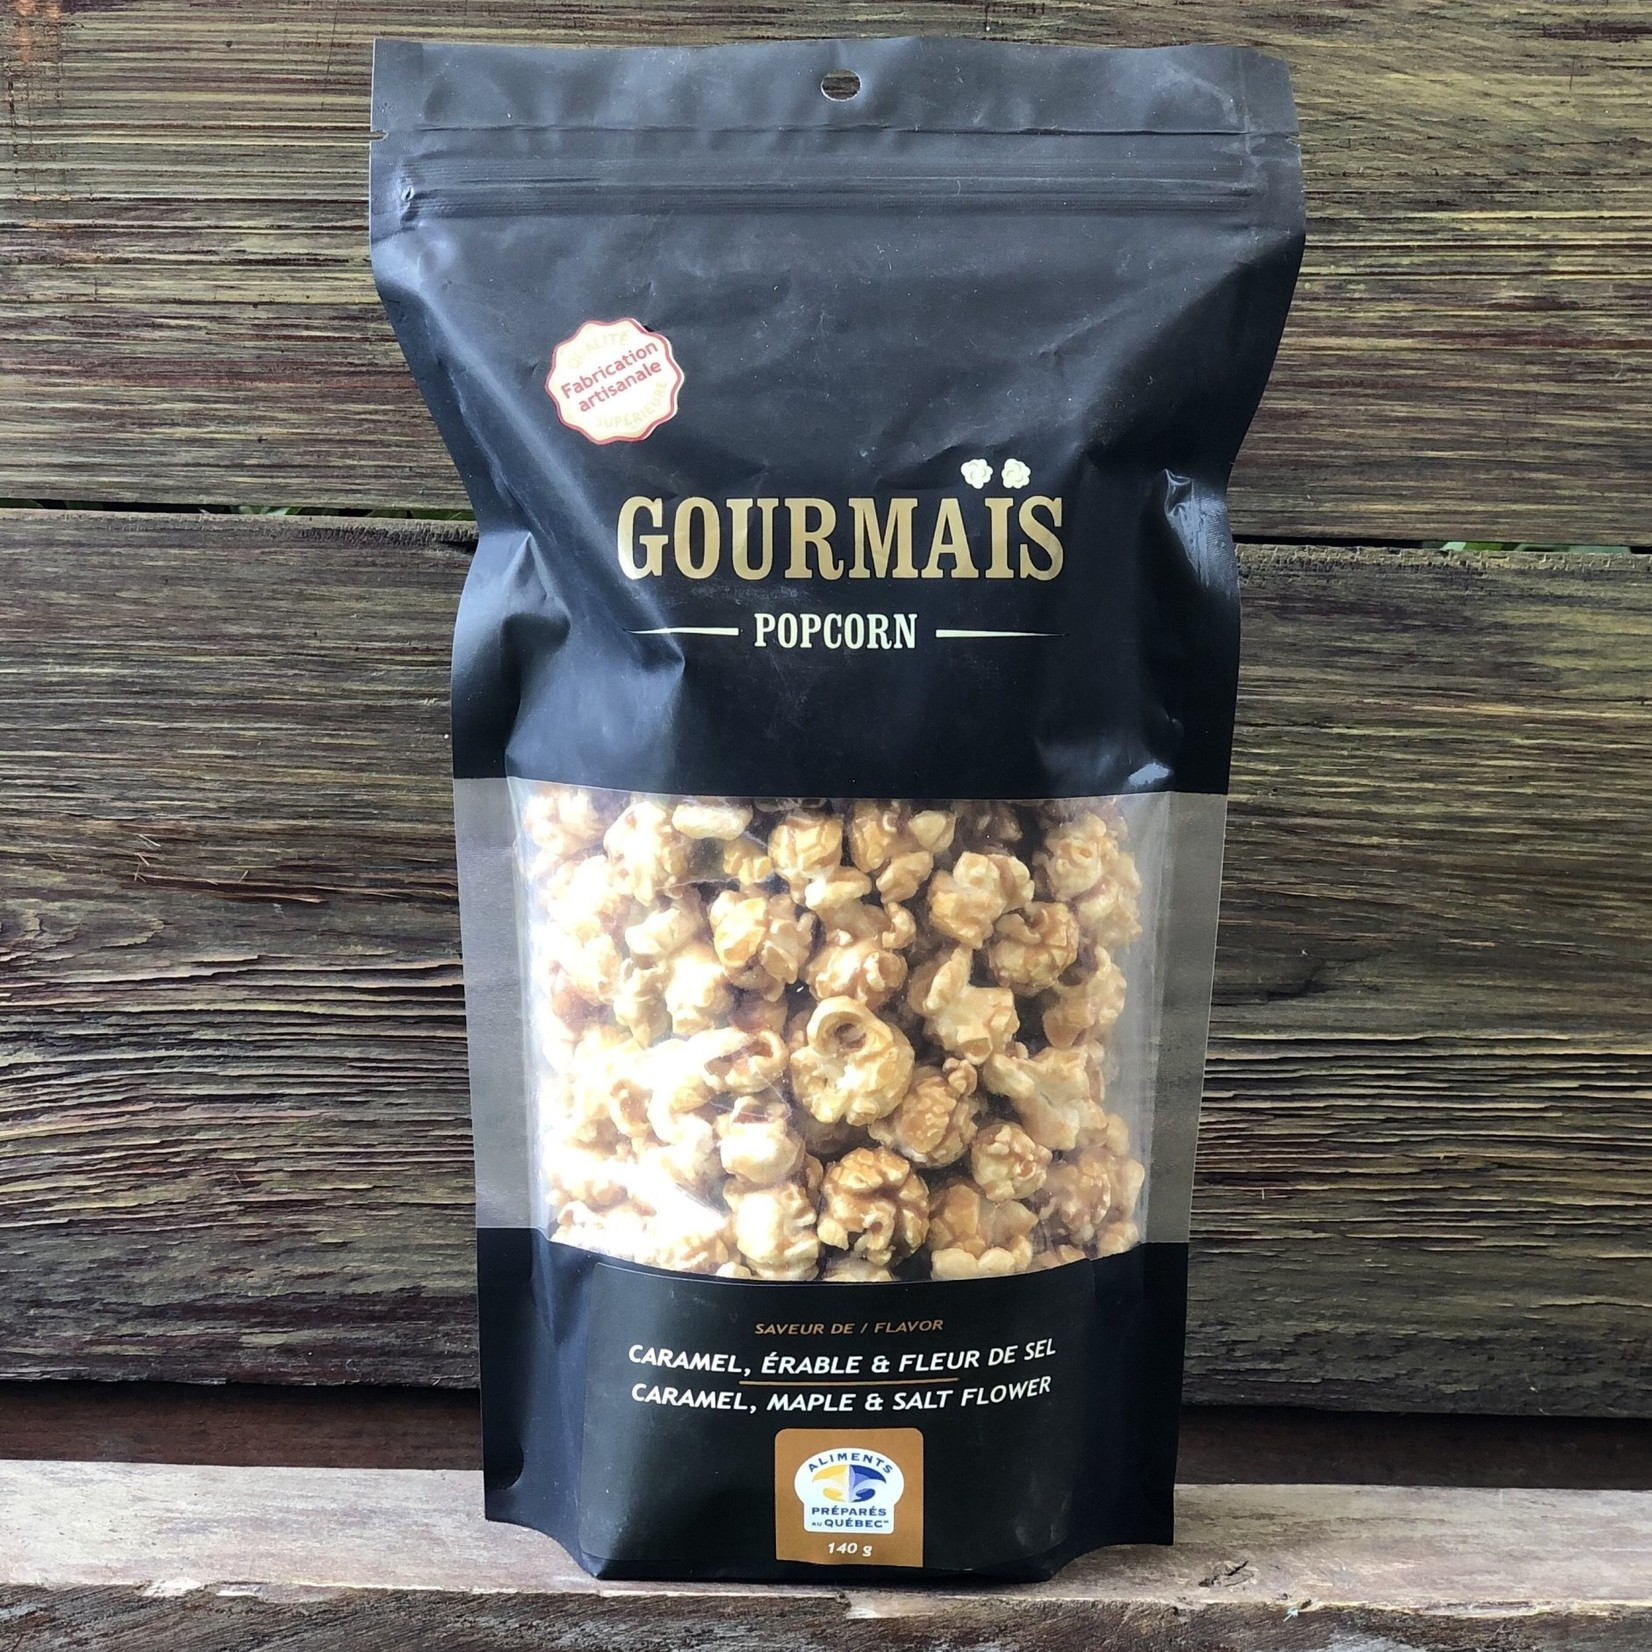 Popcorn Gourmais - Caramel, Érable & Fleur de sel